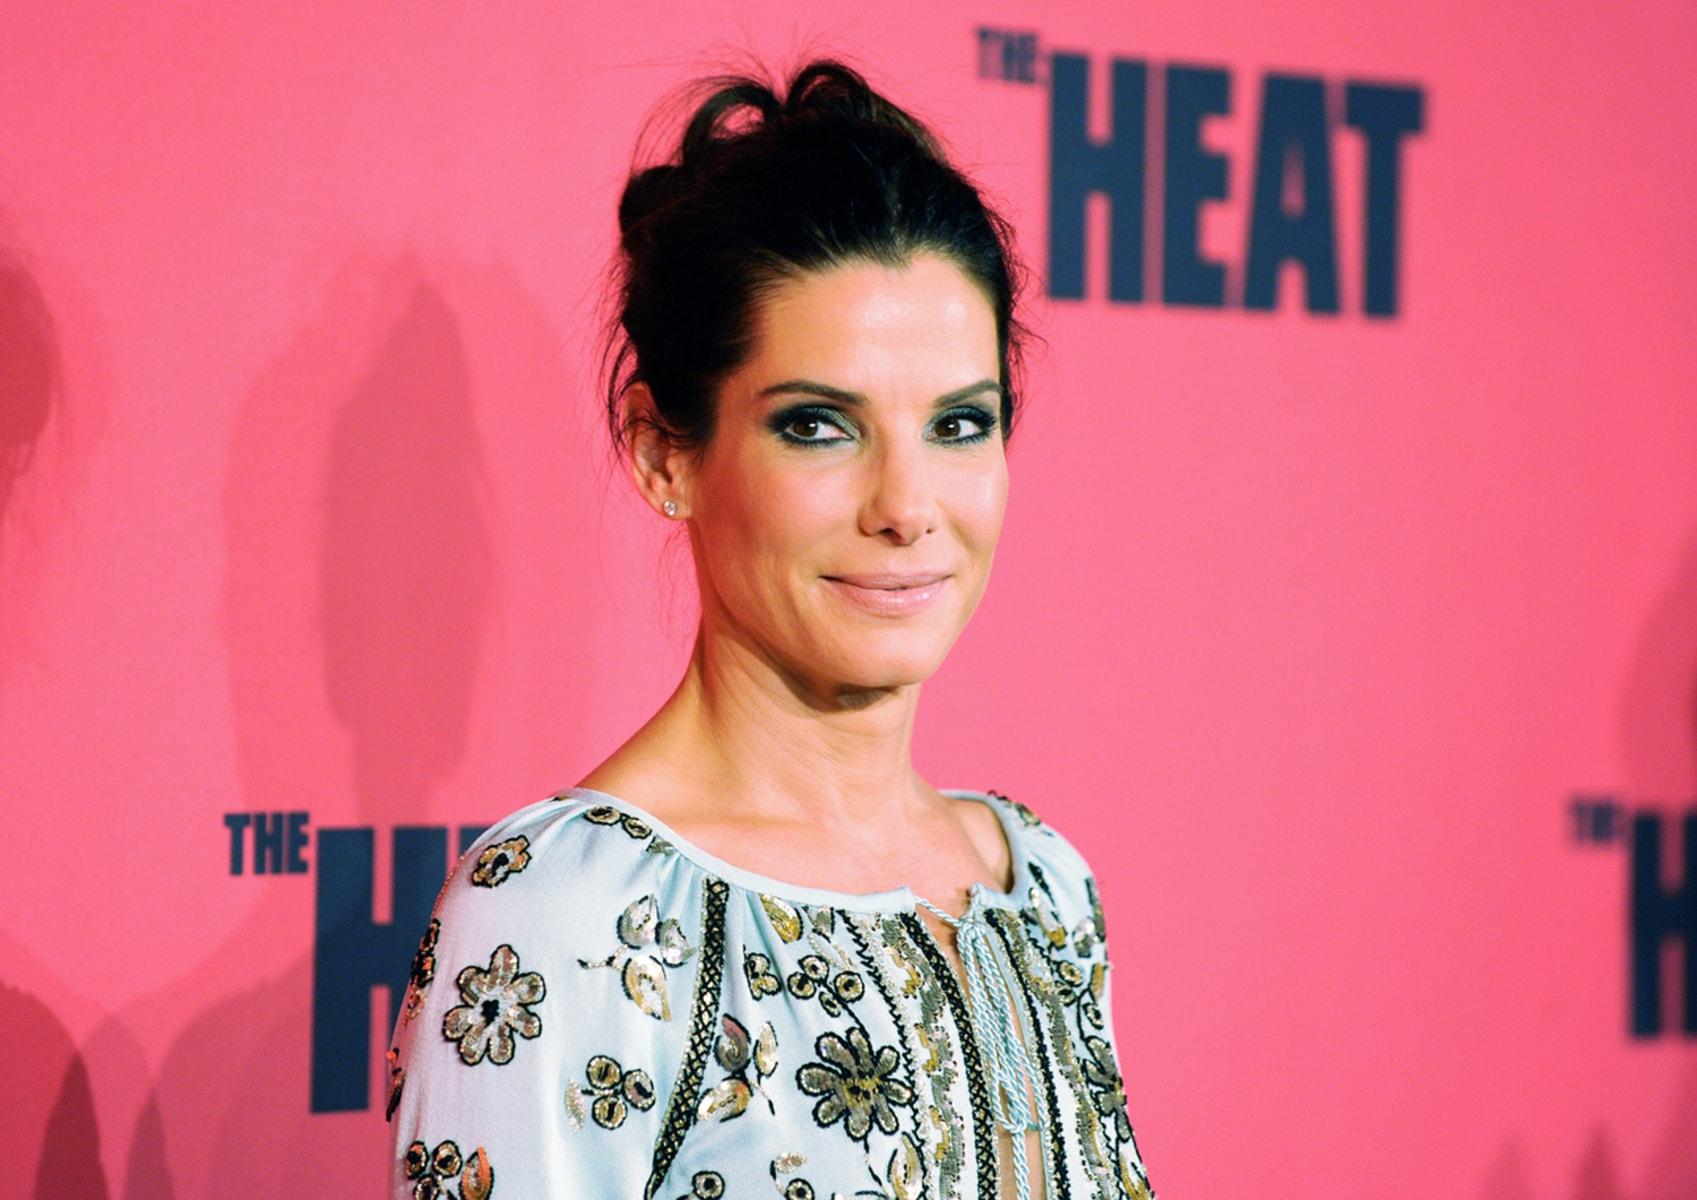 Image: The Heat film premiere